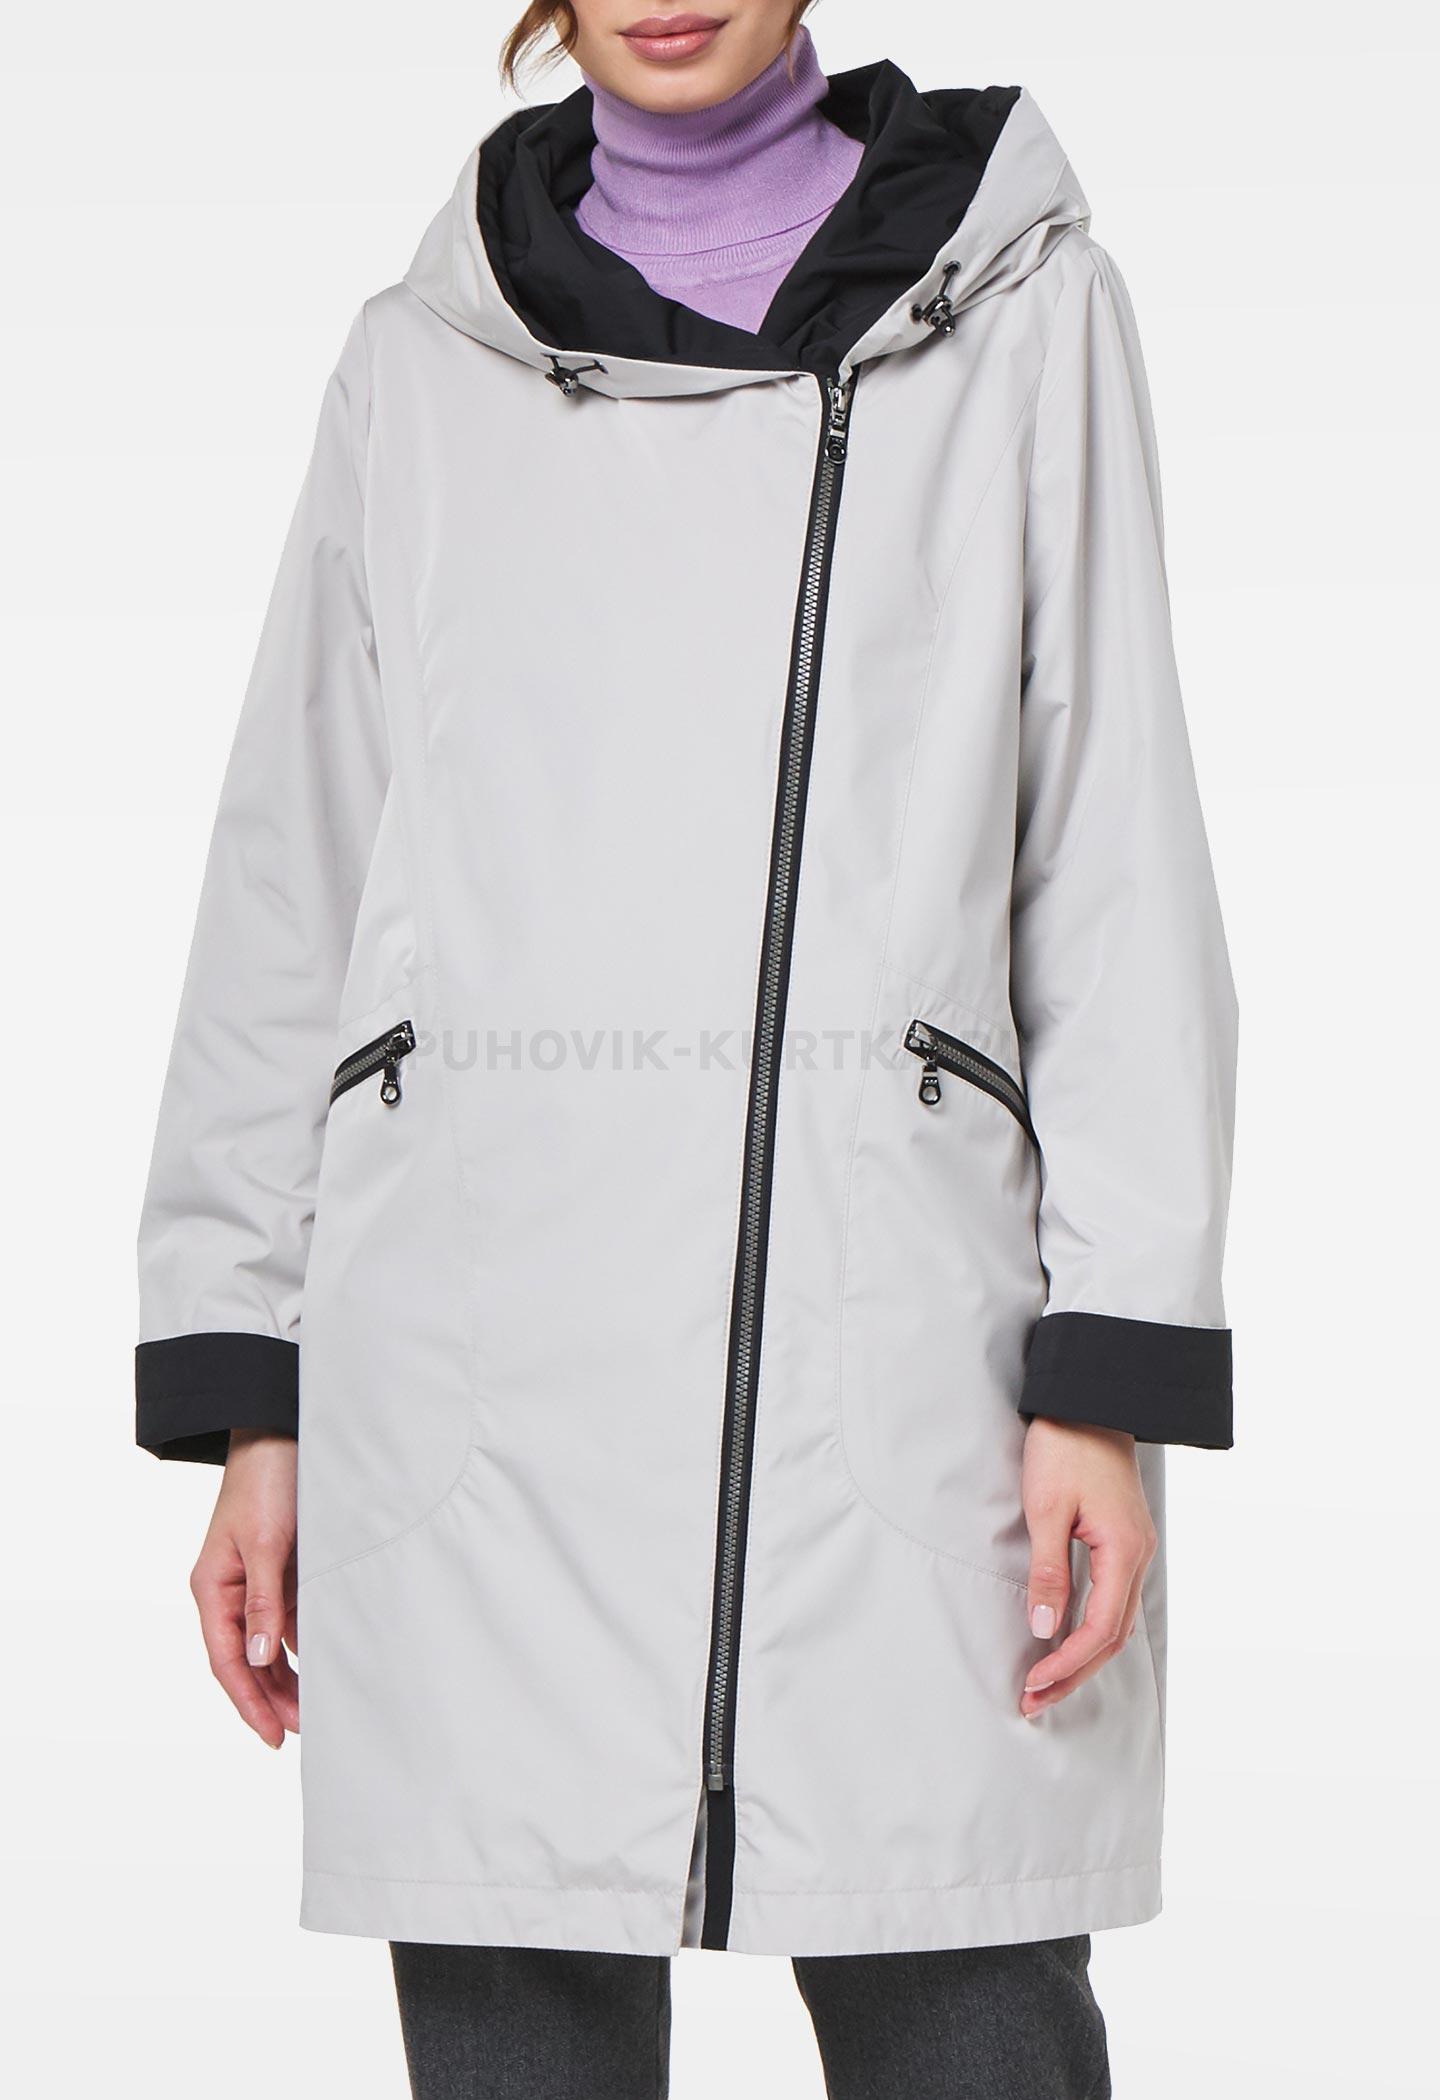 Пальто Dixi Coat 4462-156 (48/99)